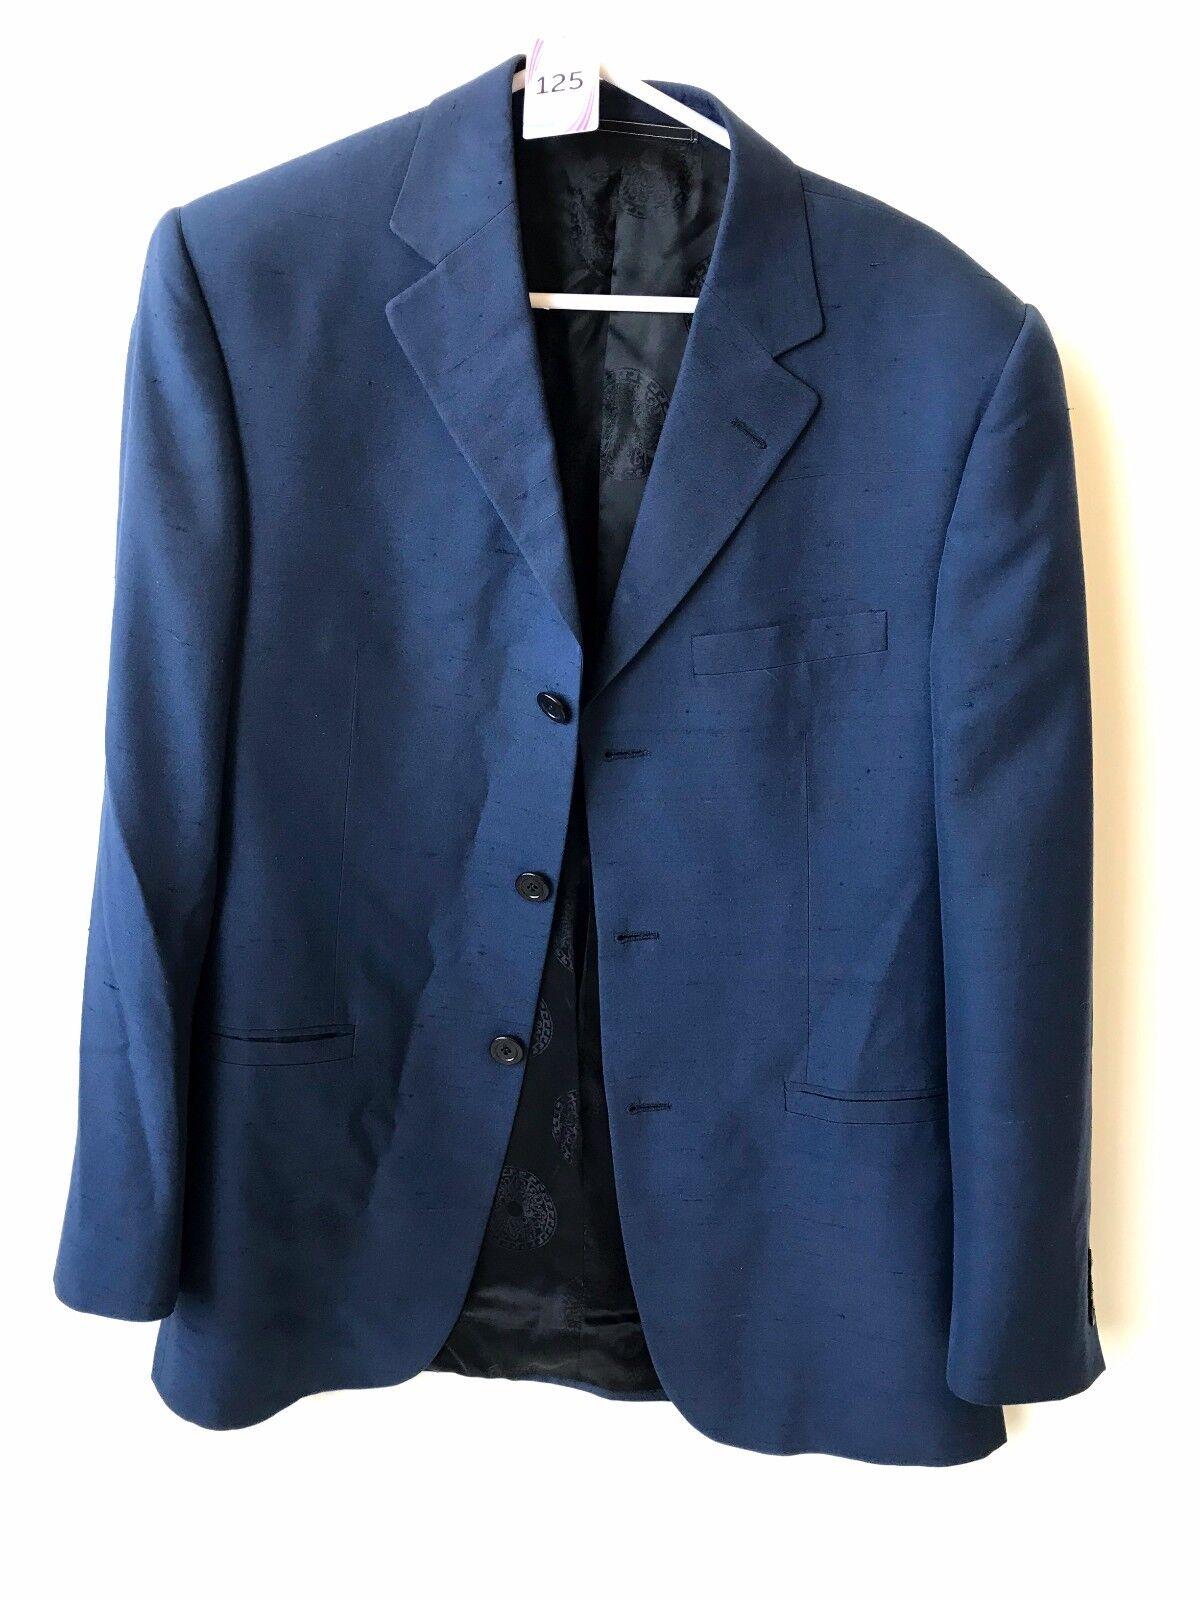 VERSACE CLASSIC V2 28S3IN Herren DARK Blau SPORT COAT SIZE 46 MADE IN ITALY